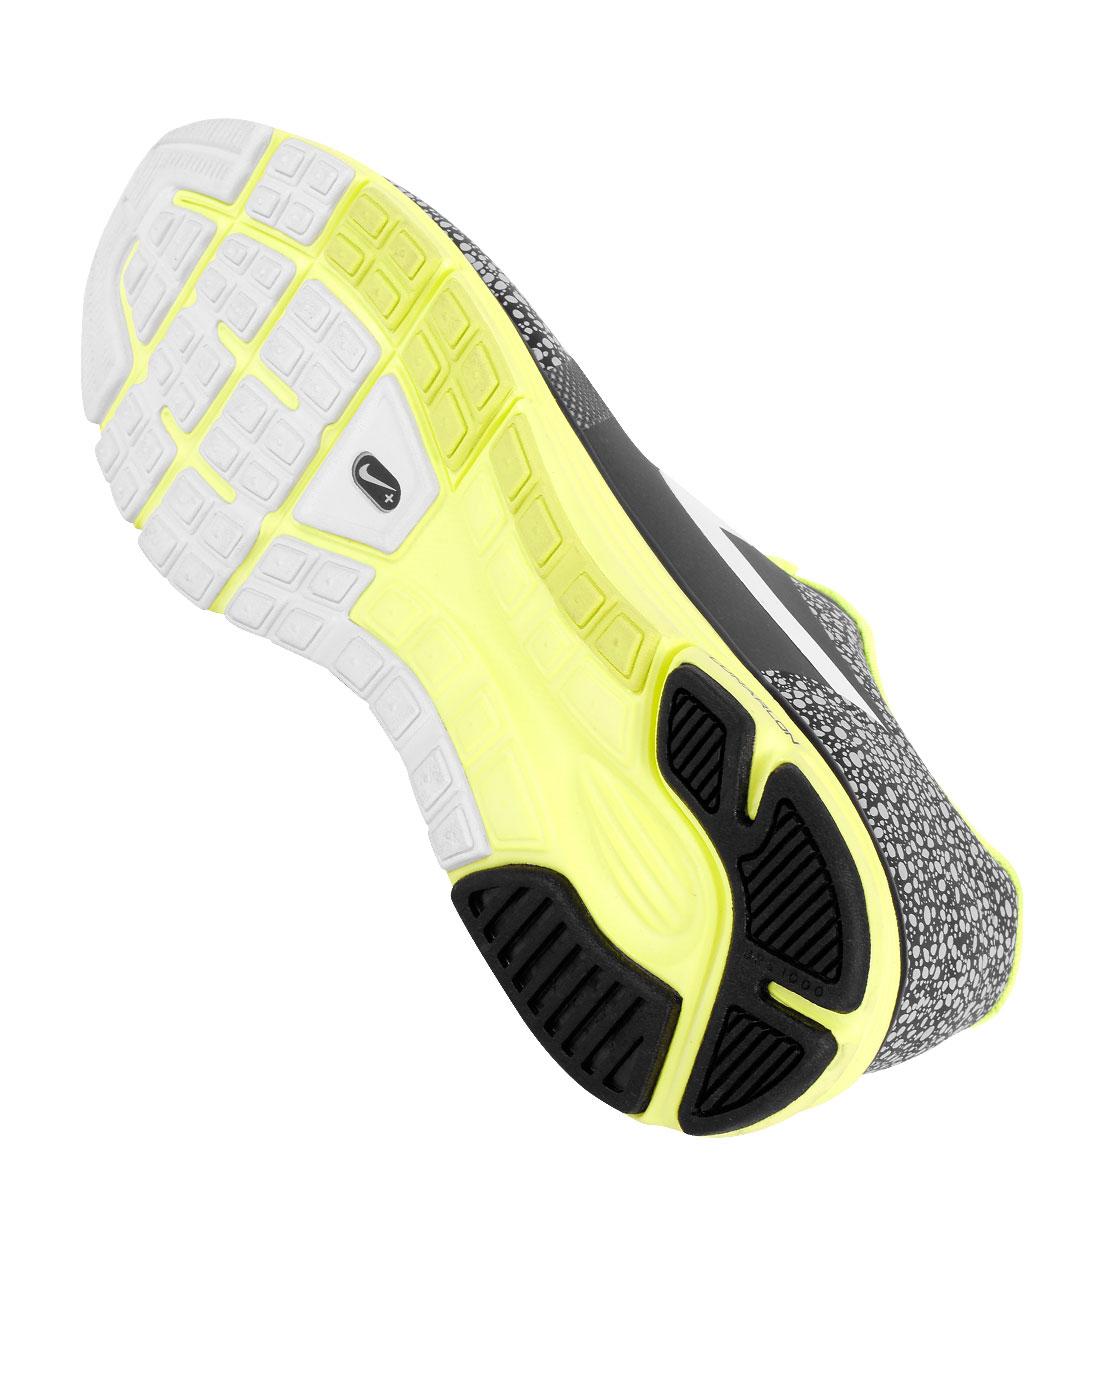 Nike Lunar Safari 'Anthracite/White-Volt-Black'